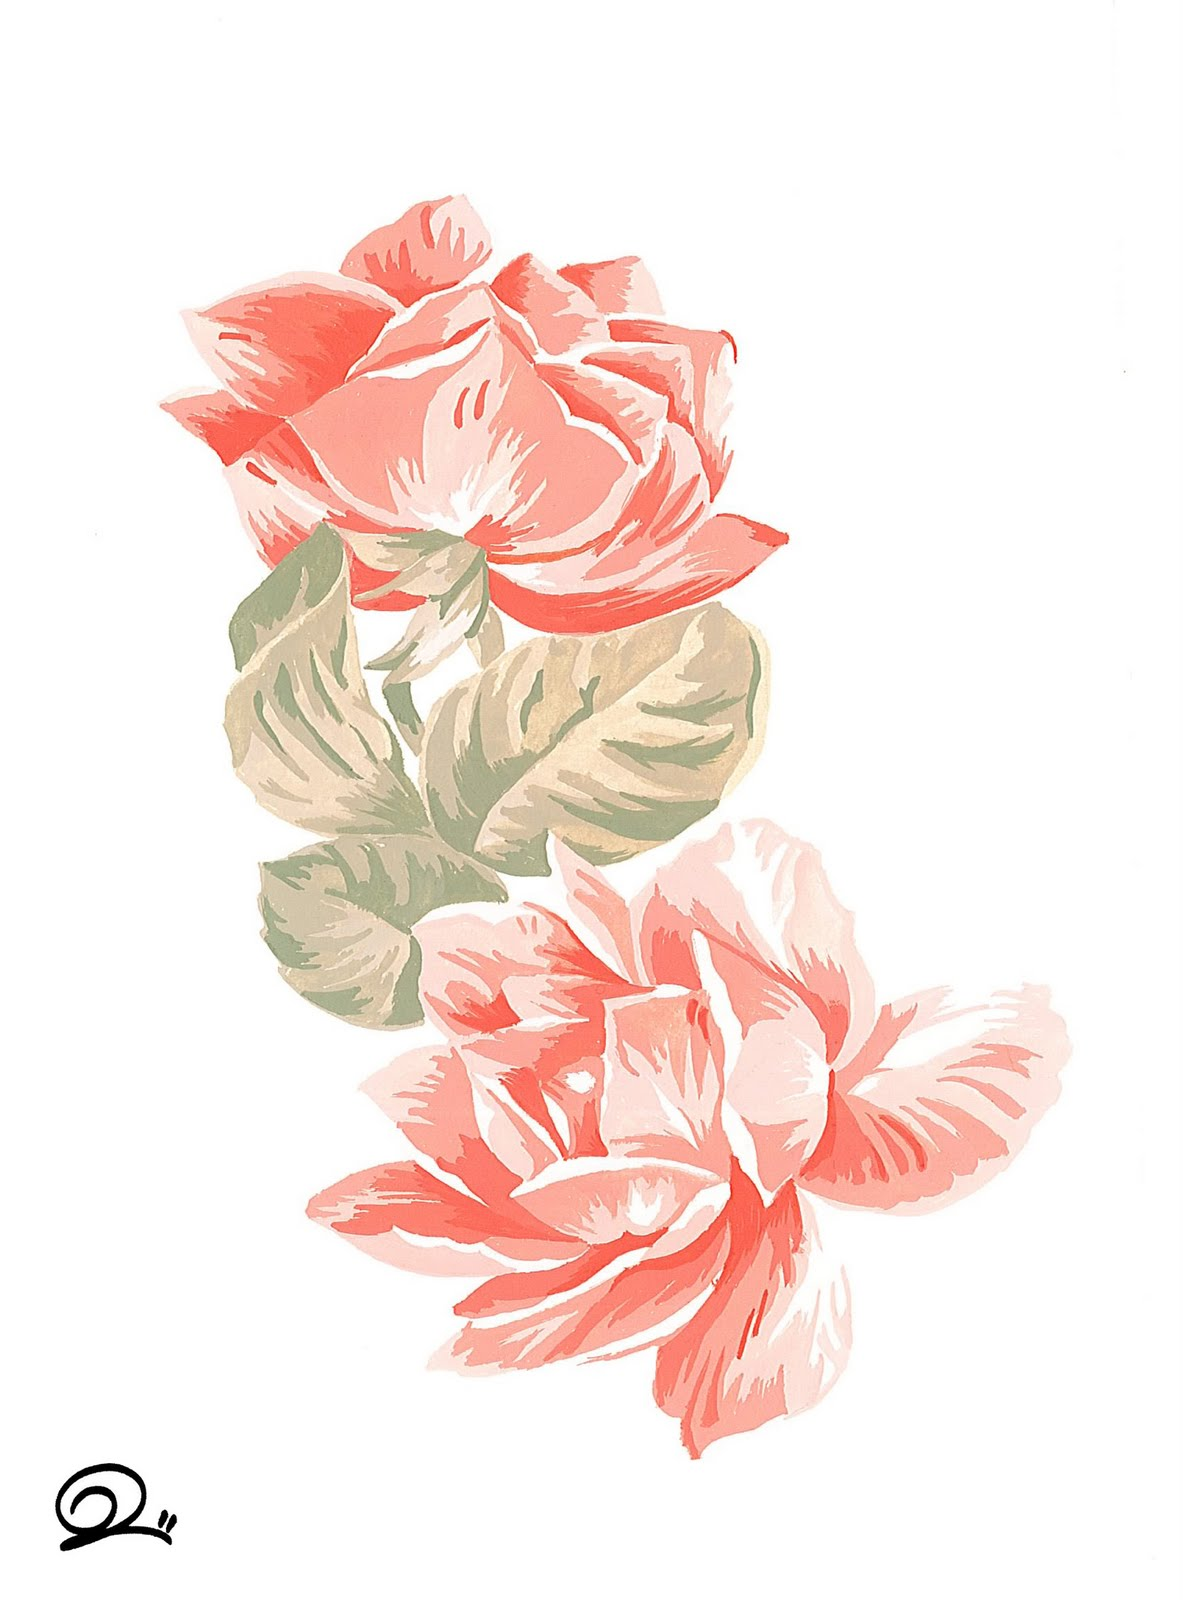 Disegni di fiori colorati a tempera for Disegni di fiori a matita